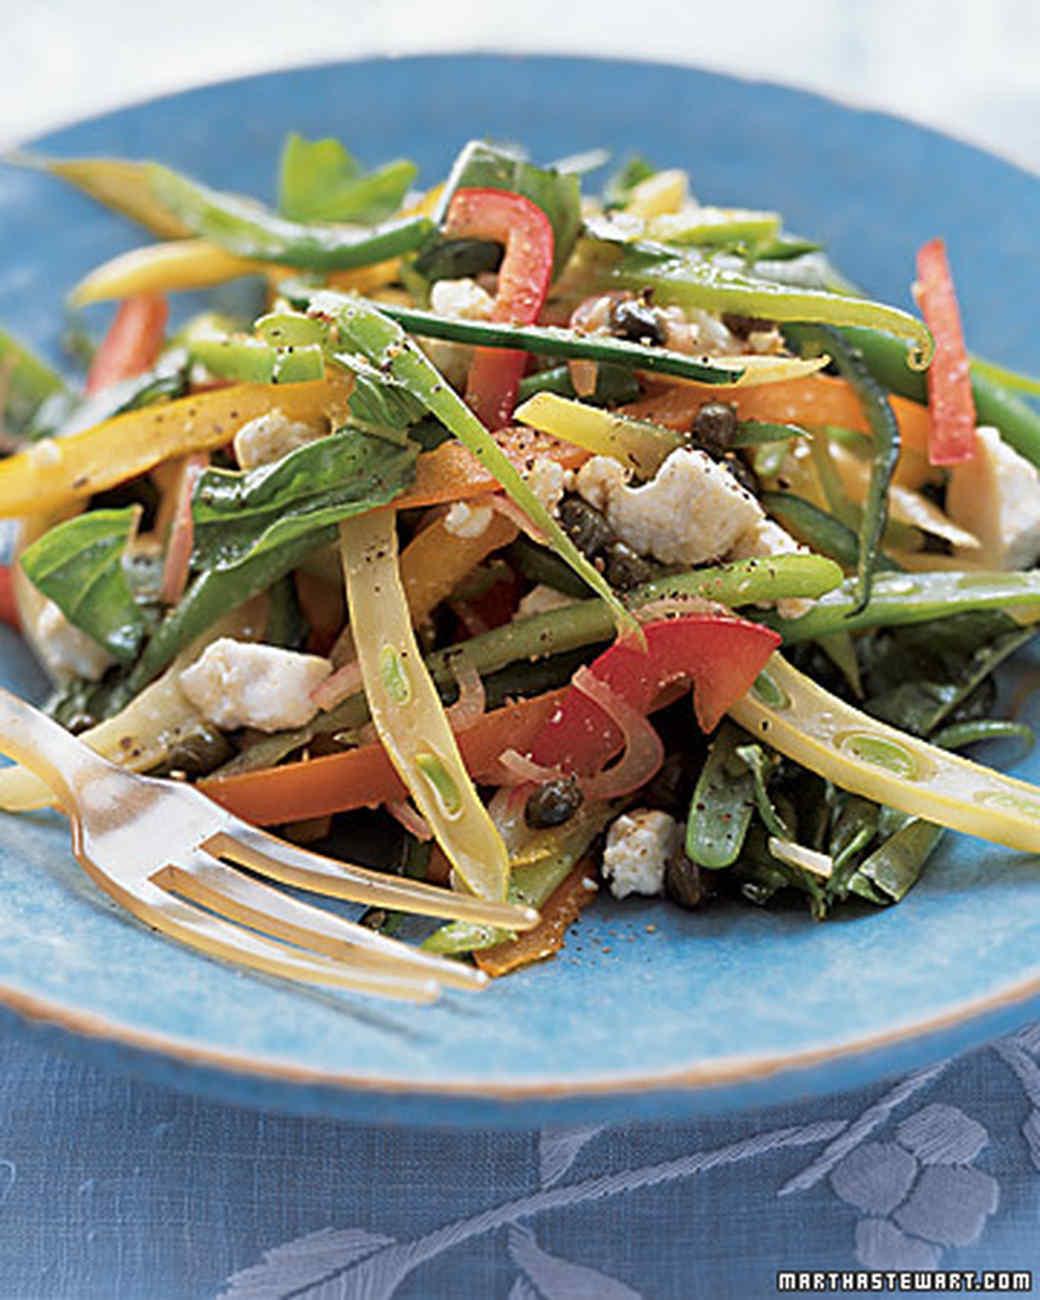 ml207_sip08_pepp_salad.jpg